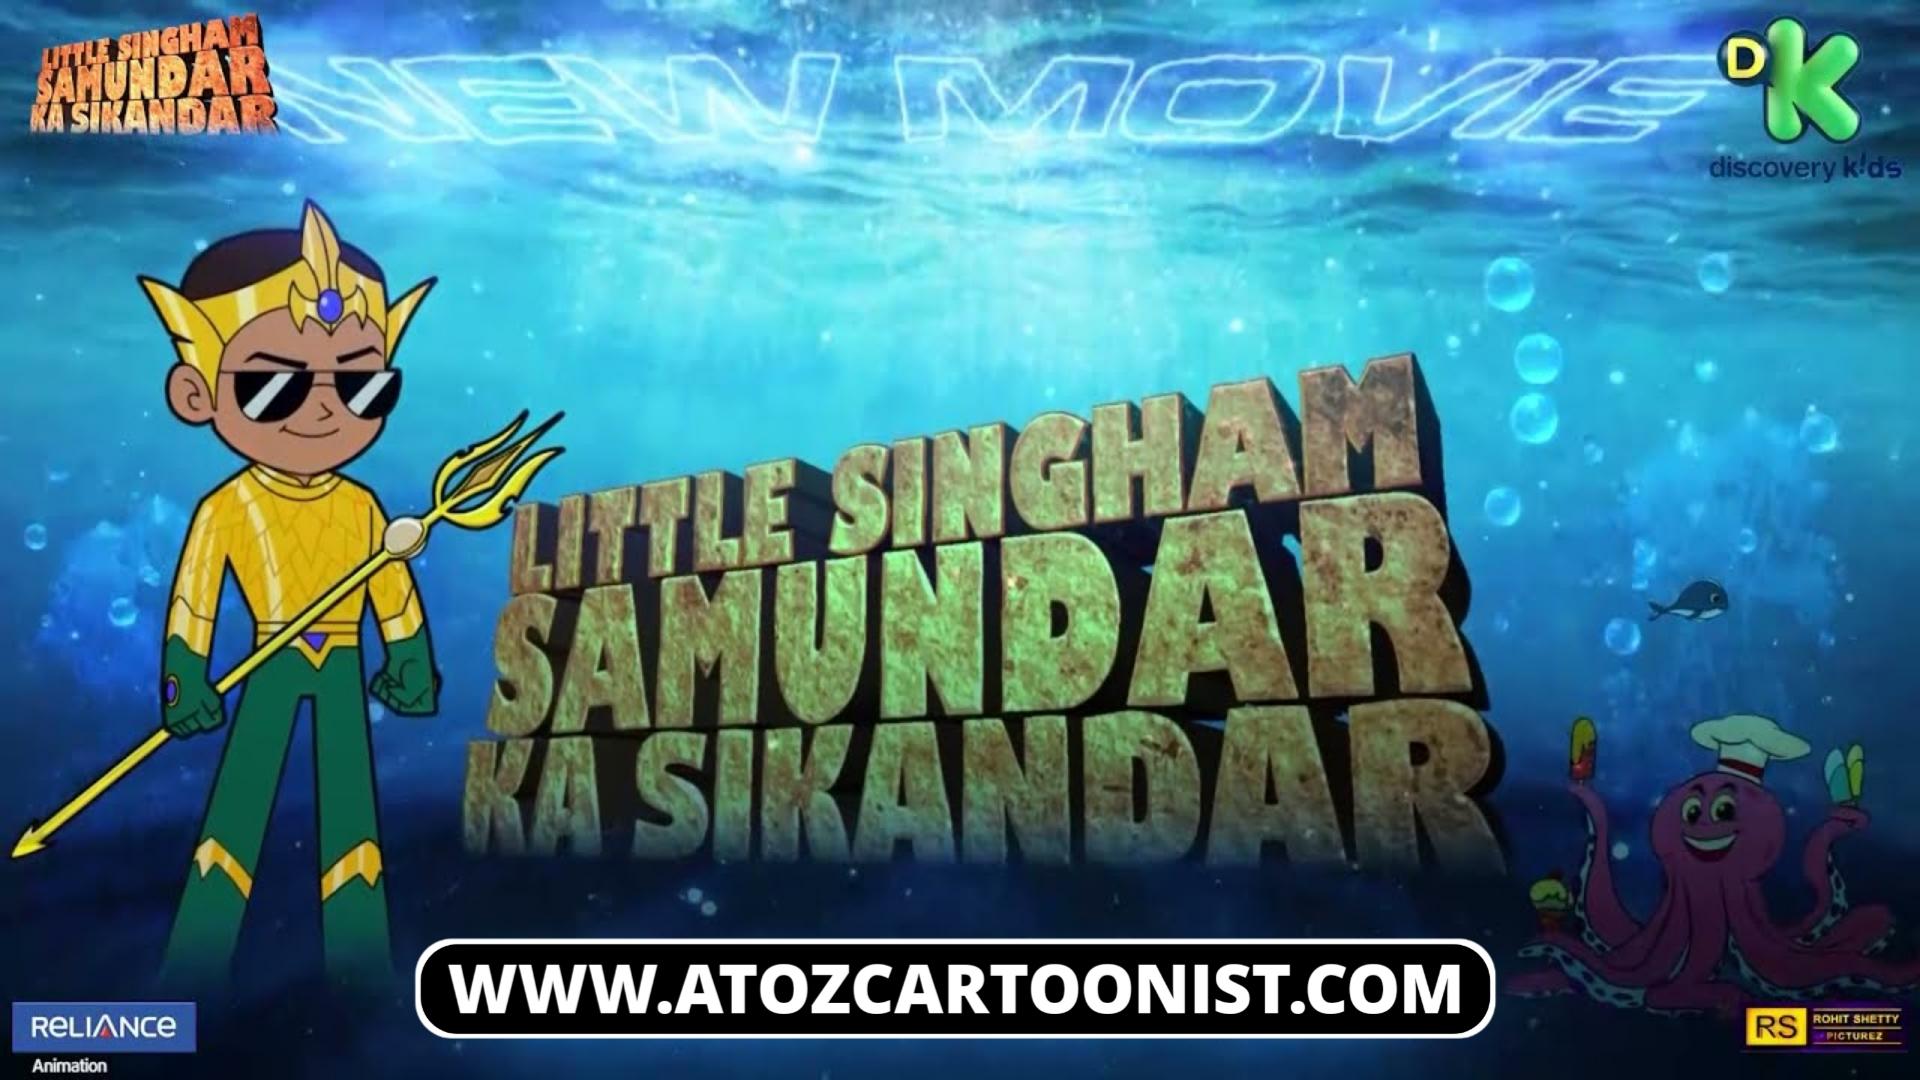 LITTLE SINGHAM : SAMUNDAR KA SIKANDAR FULL MOVIE IN HINDI DOWNLOAD (480P H